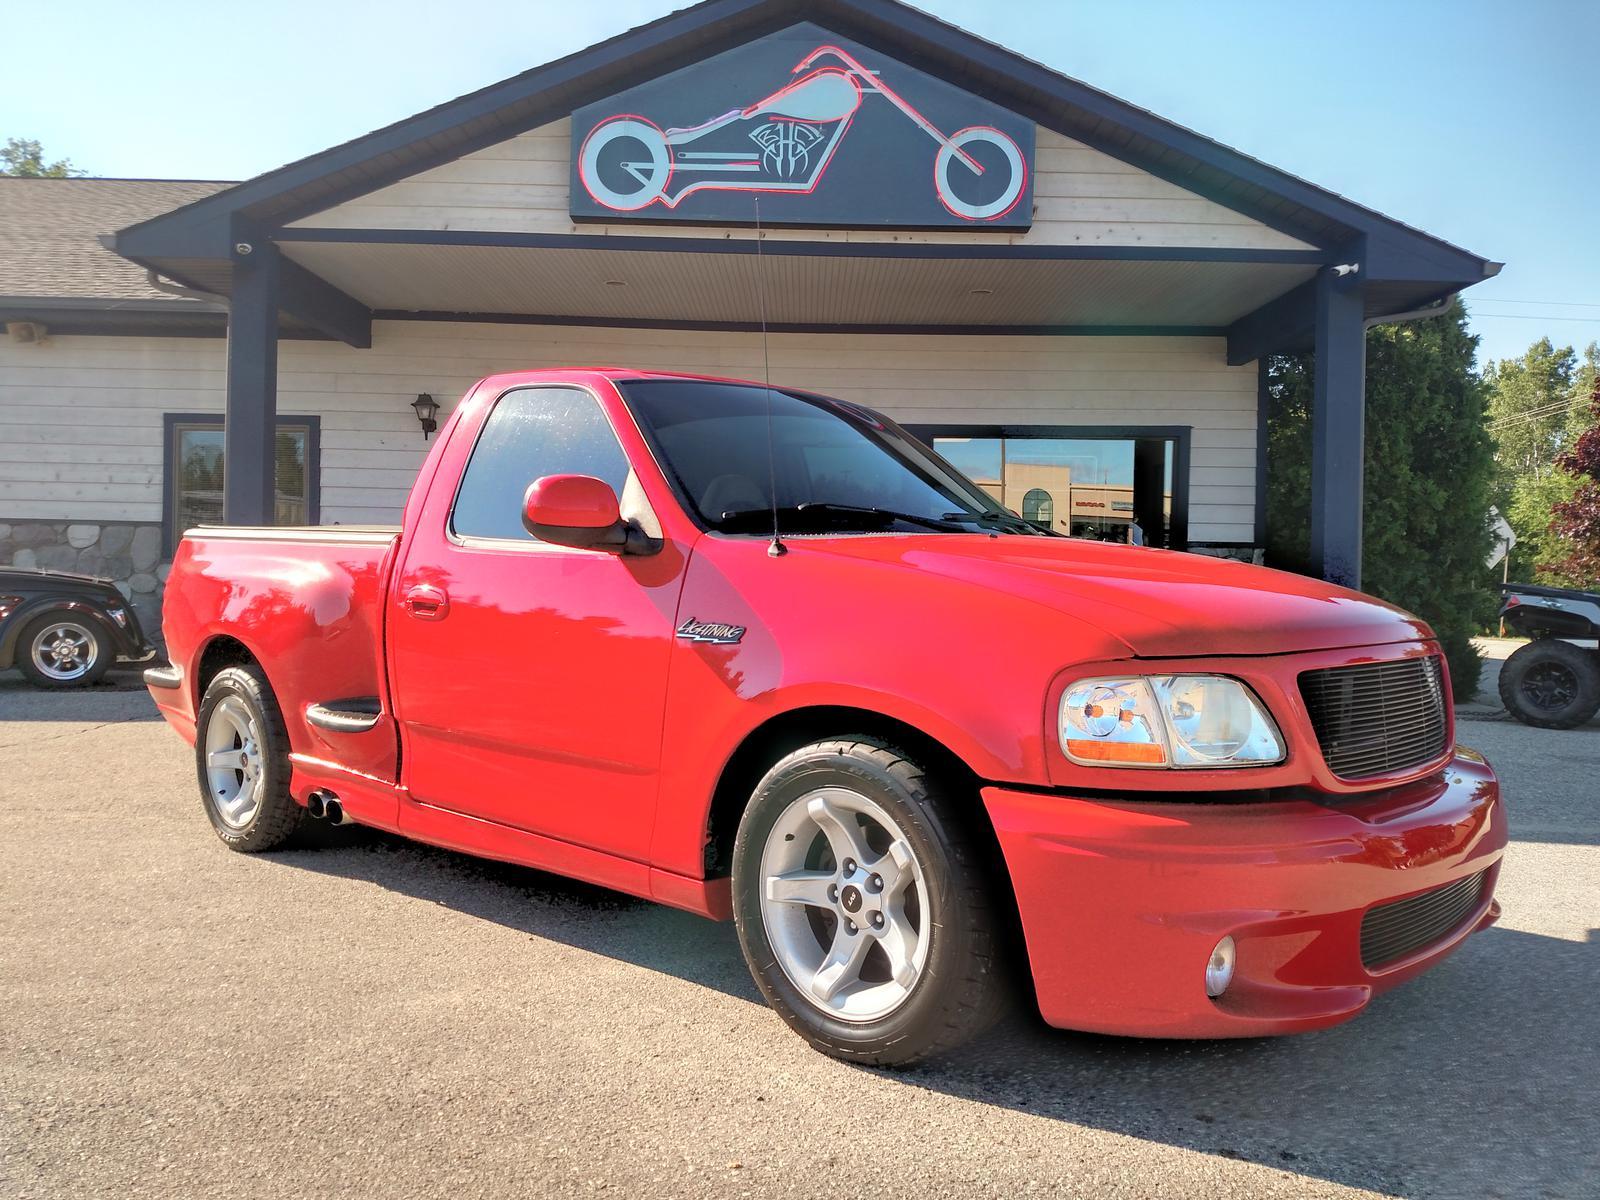 2000 Ford F 150 Svt Lightning For Sale In Petoskey Mi Miller S Us 31 Sales Petoskey Mi 231 348 5838